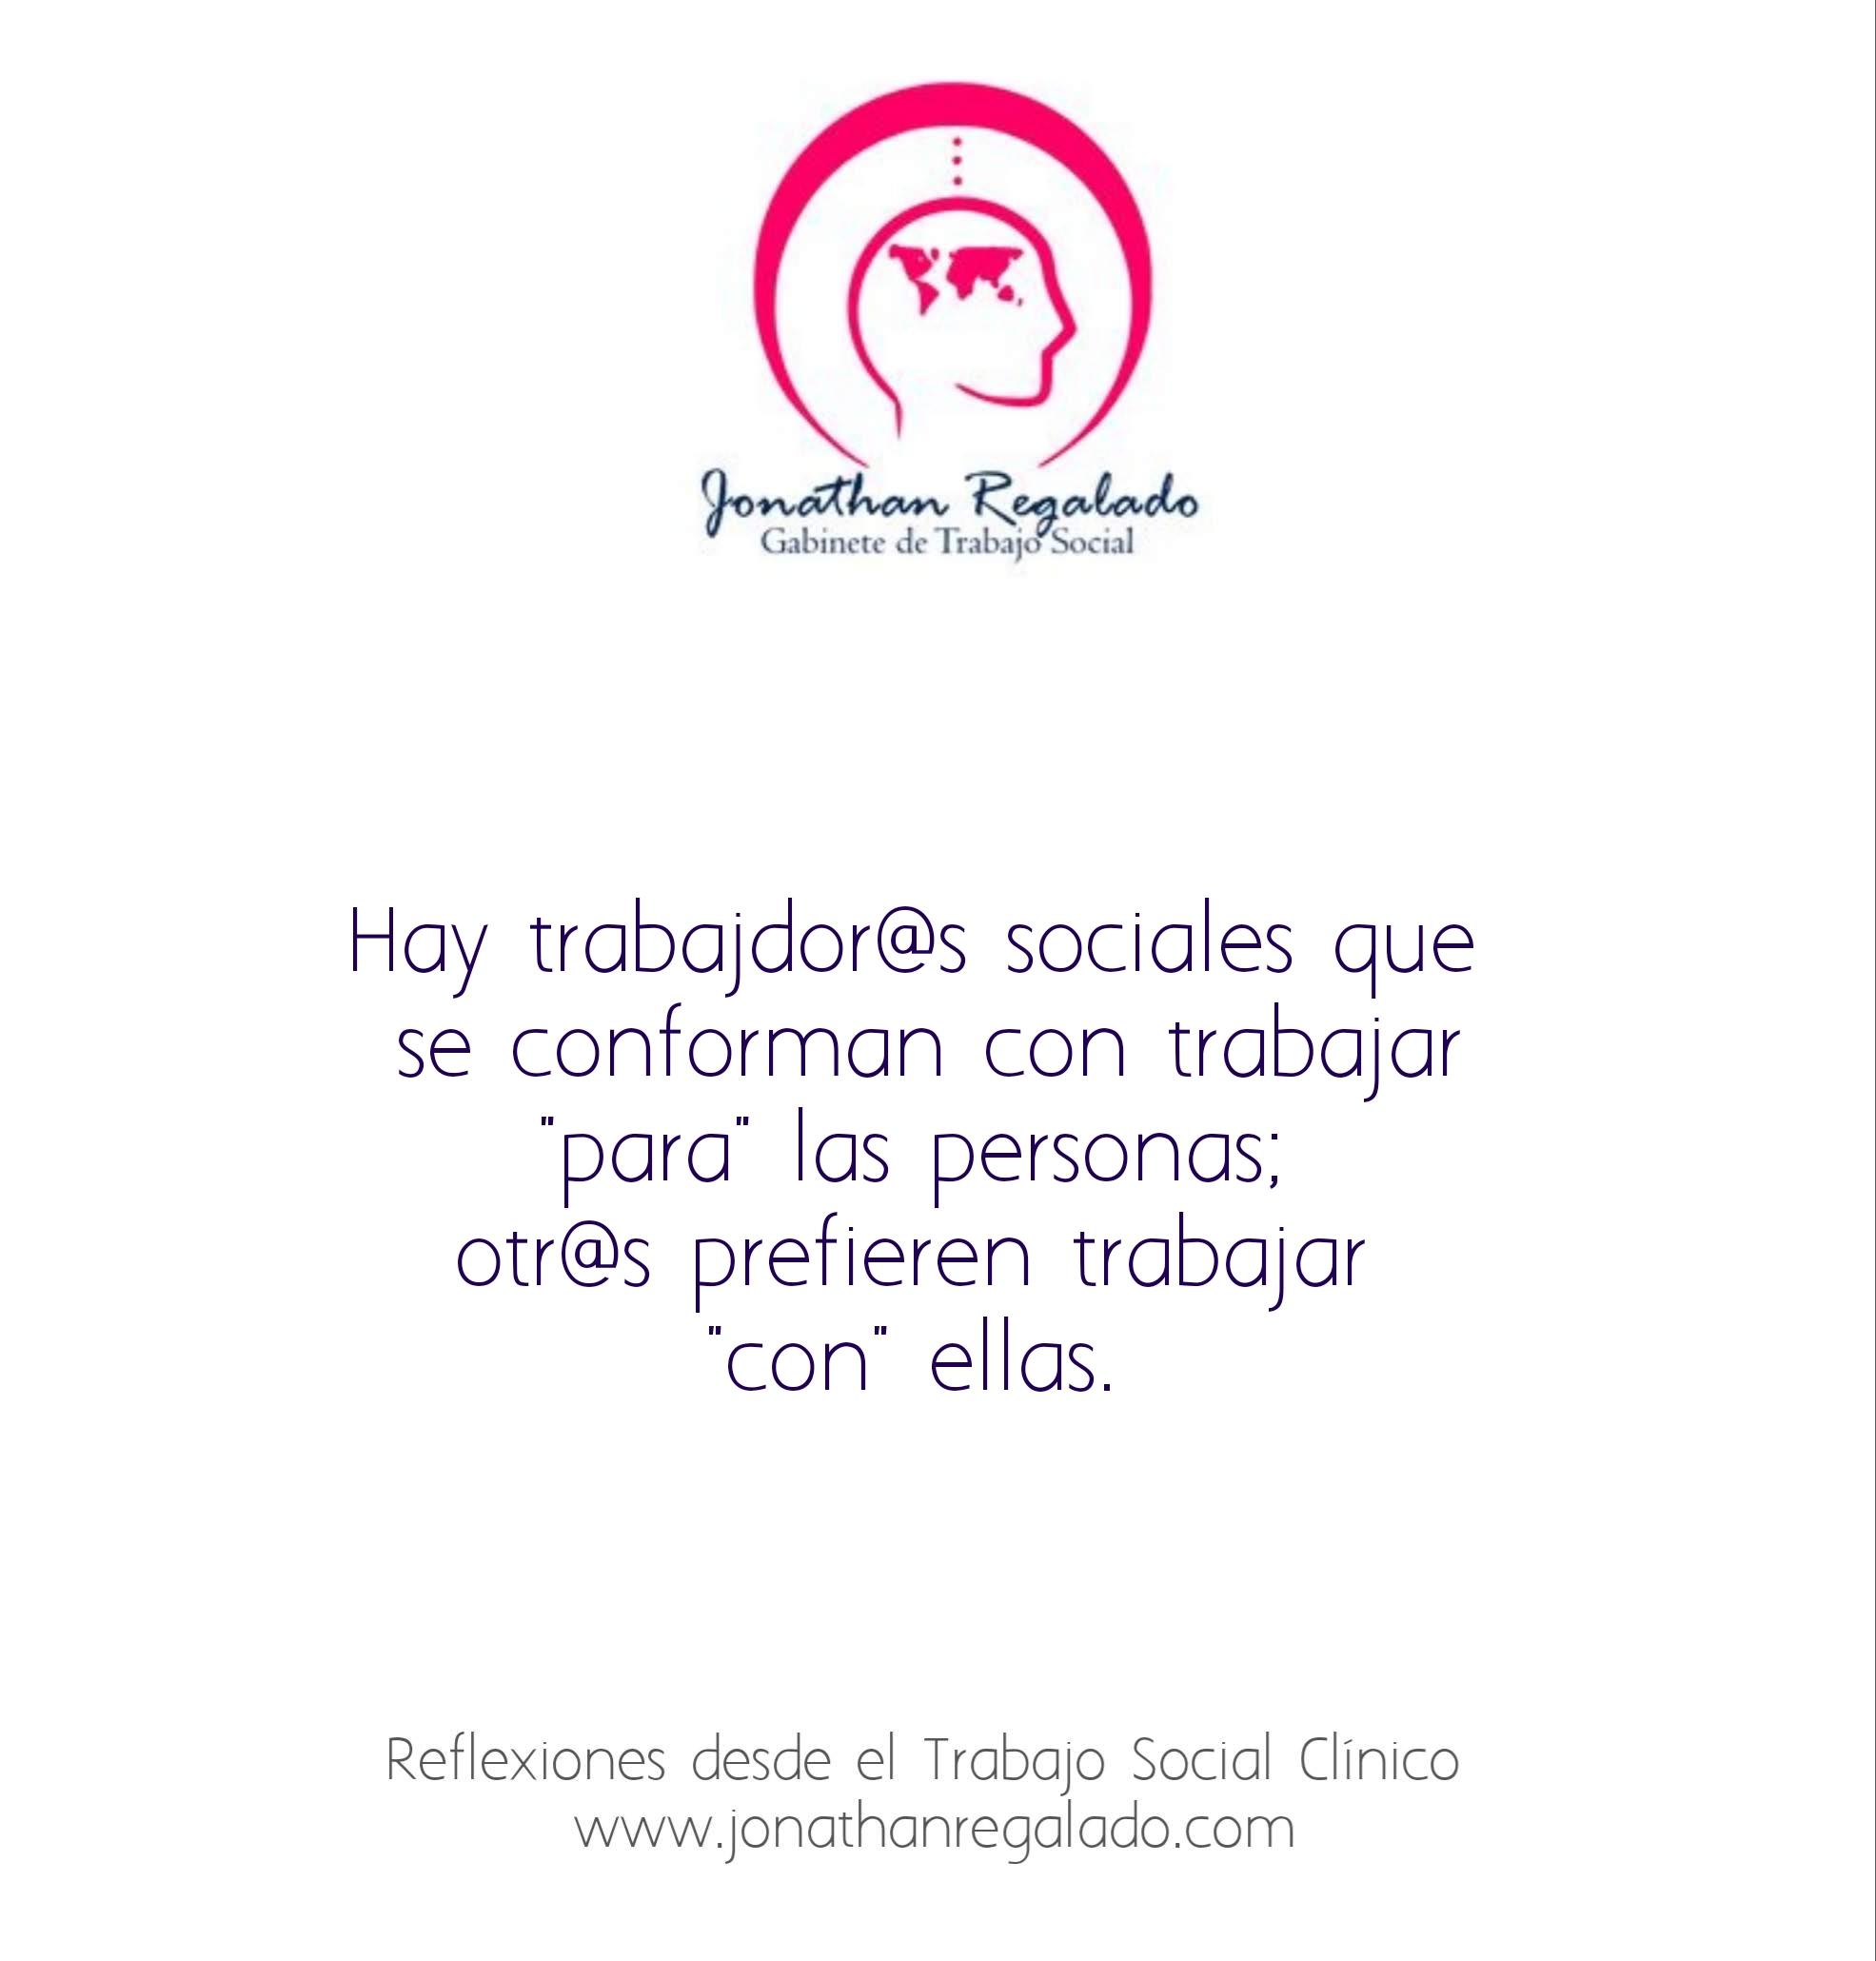 Blanco_20200515070606255